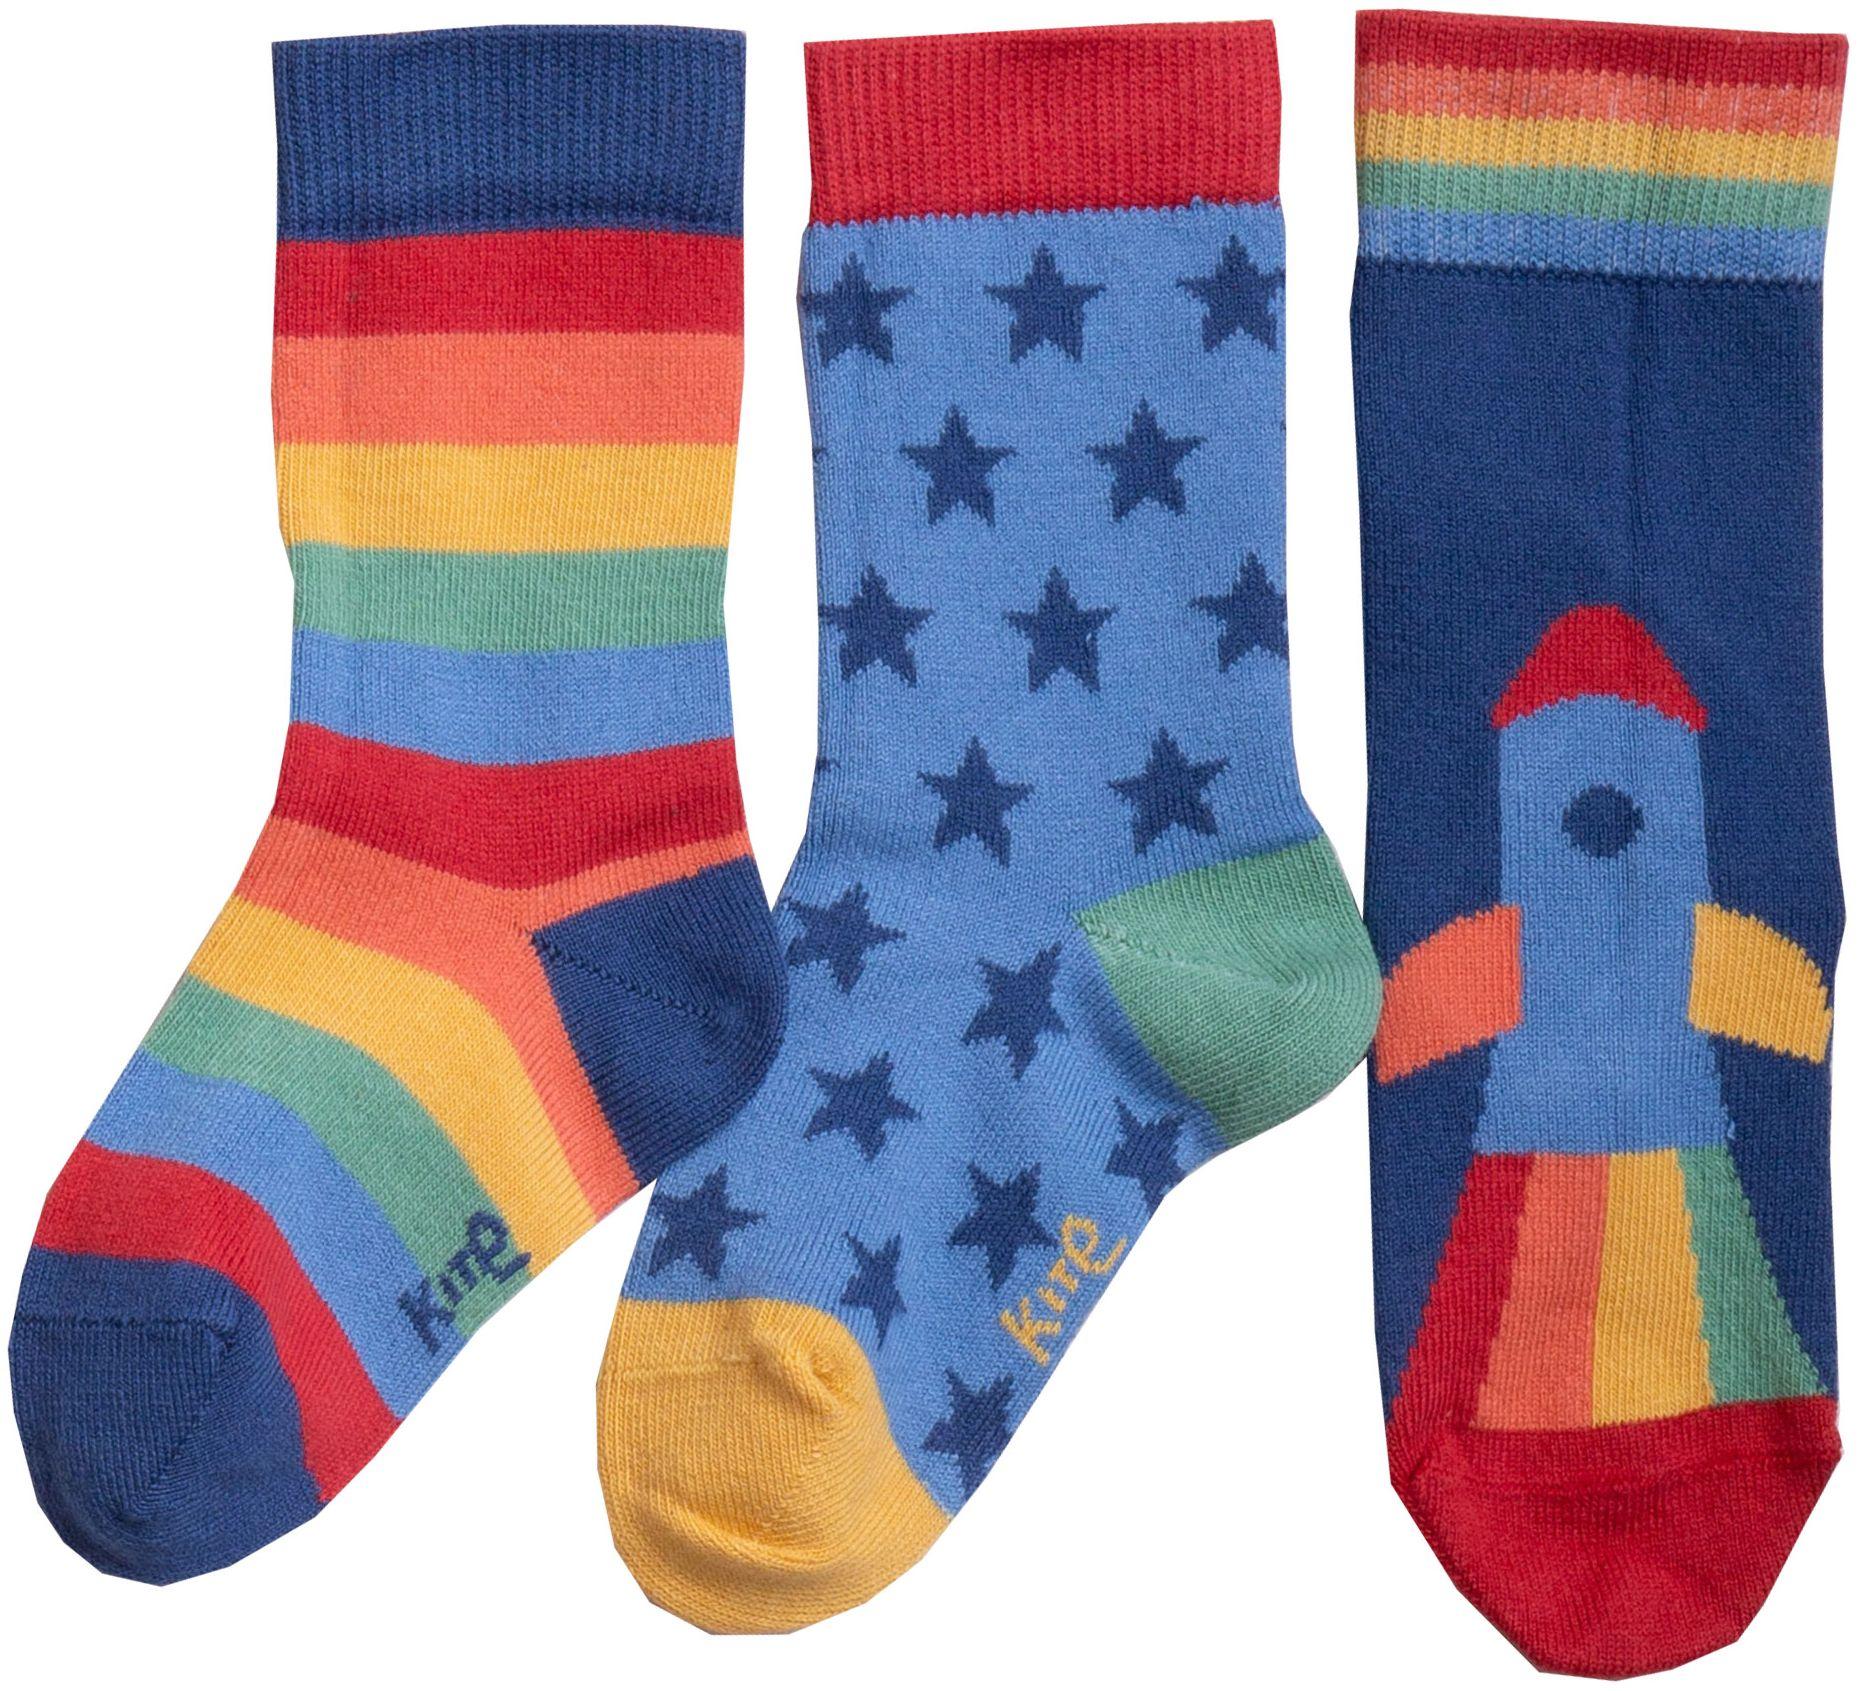 Gemusterte Kinder-Socken im 3er-Pack mit Regenbogen-Rakete